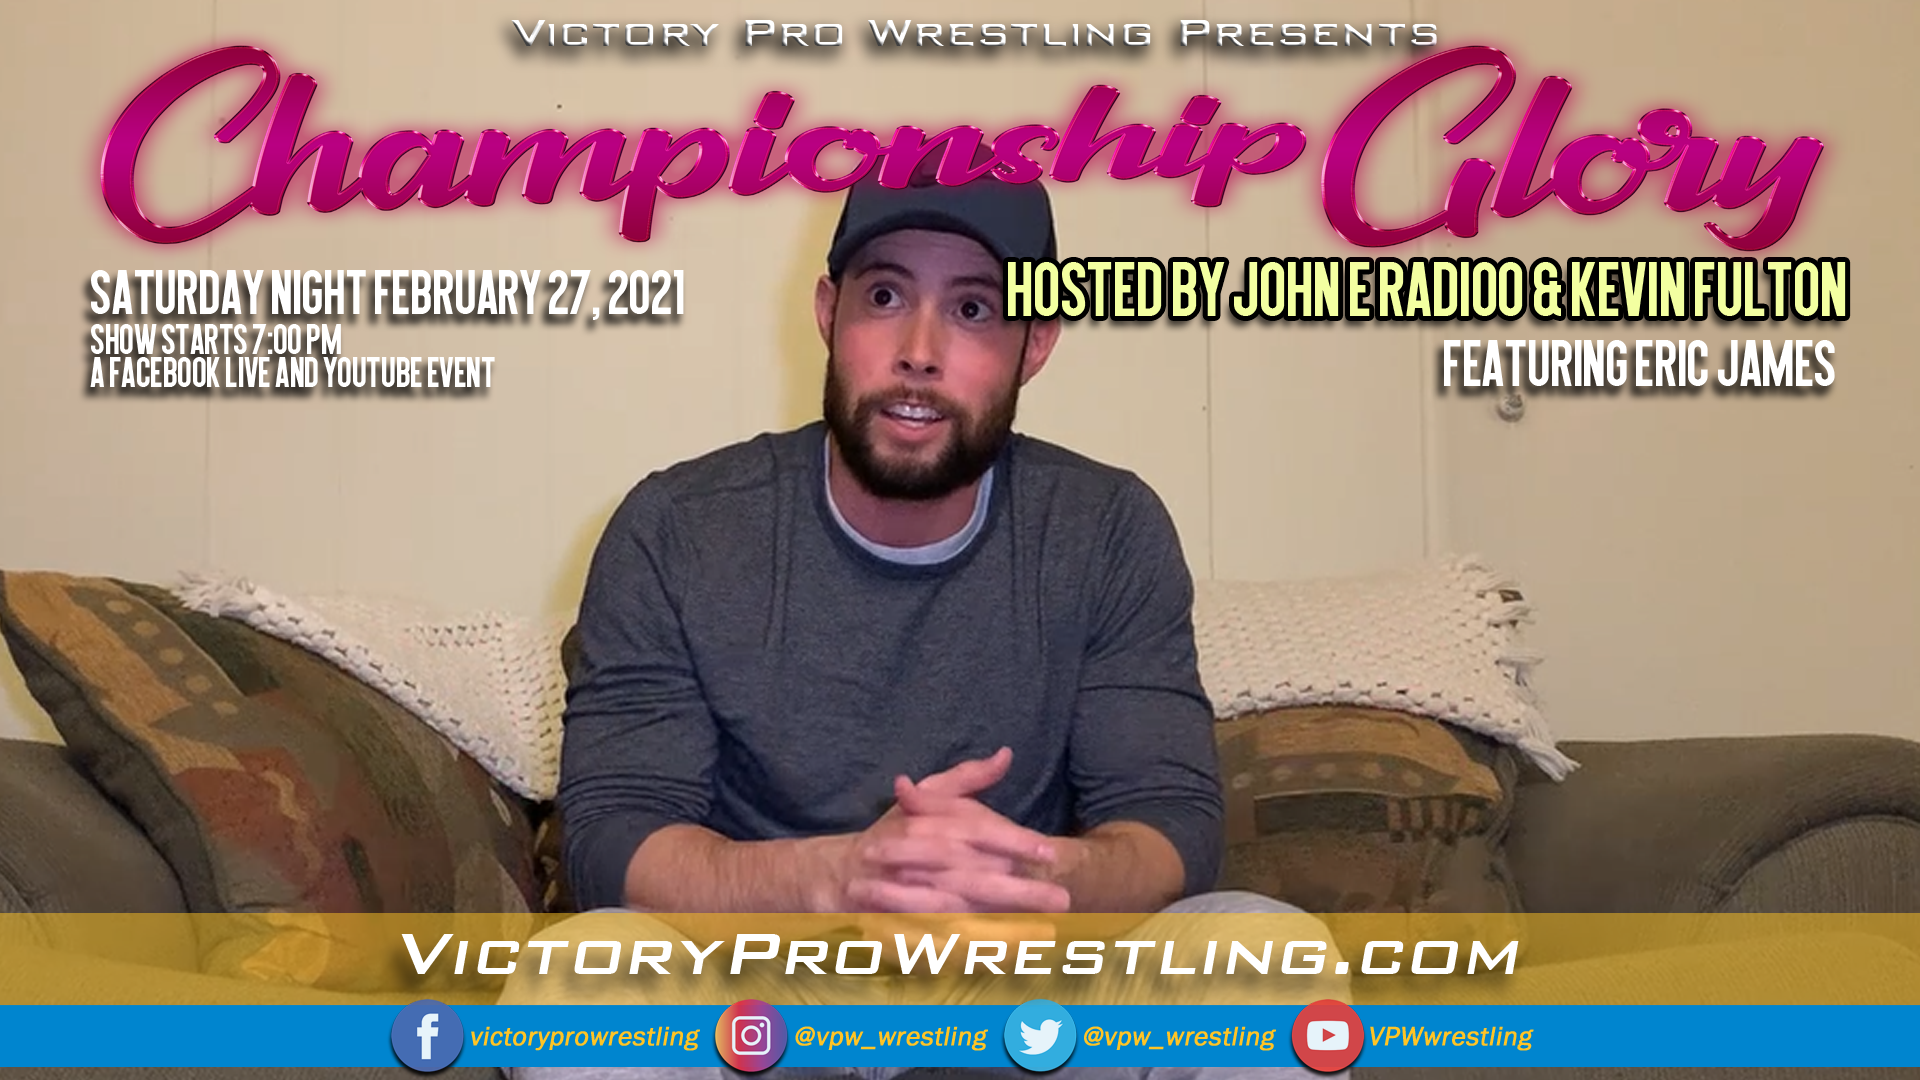 VPW Presents Championship Glory